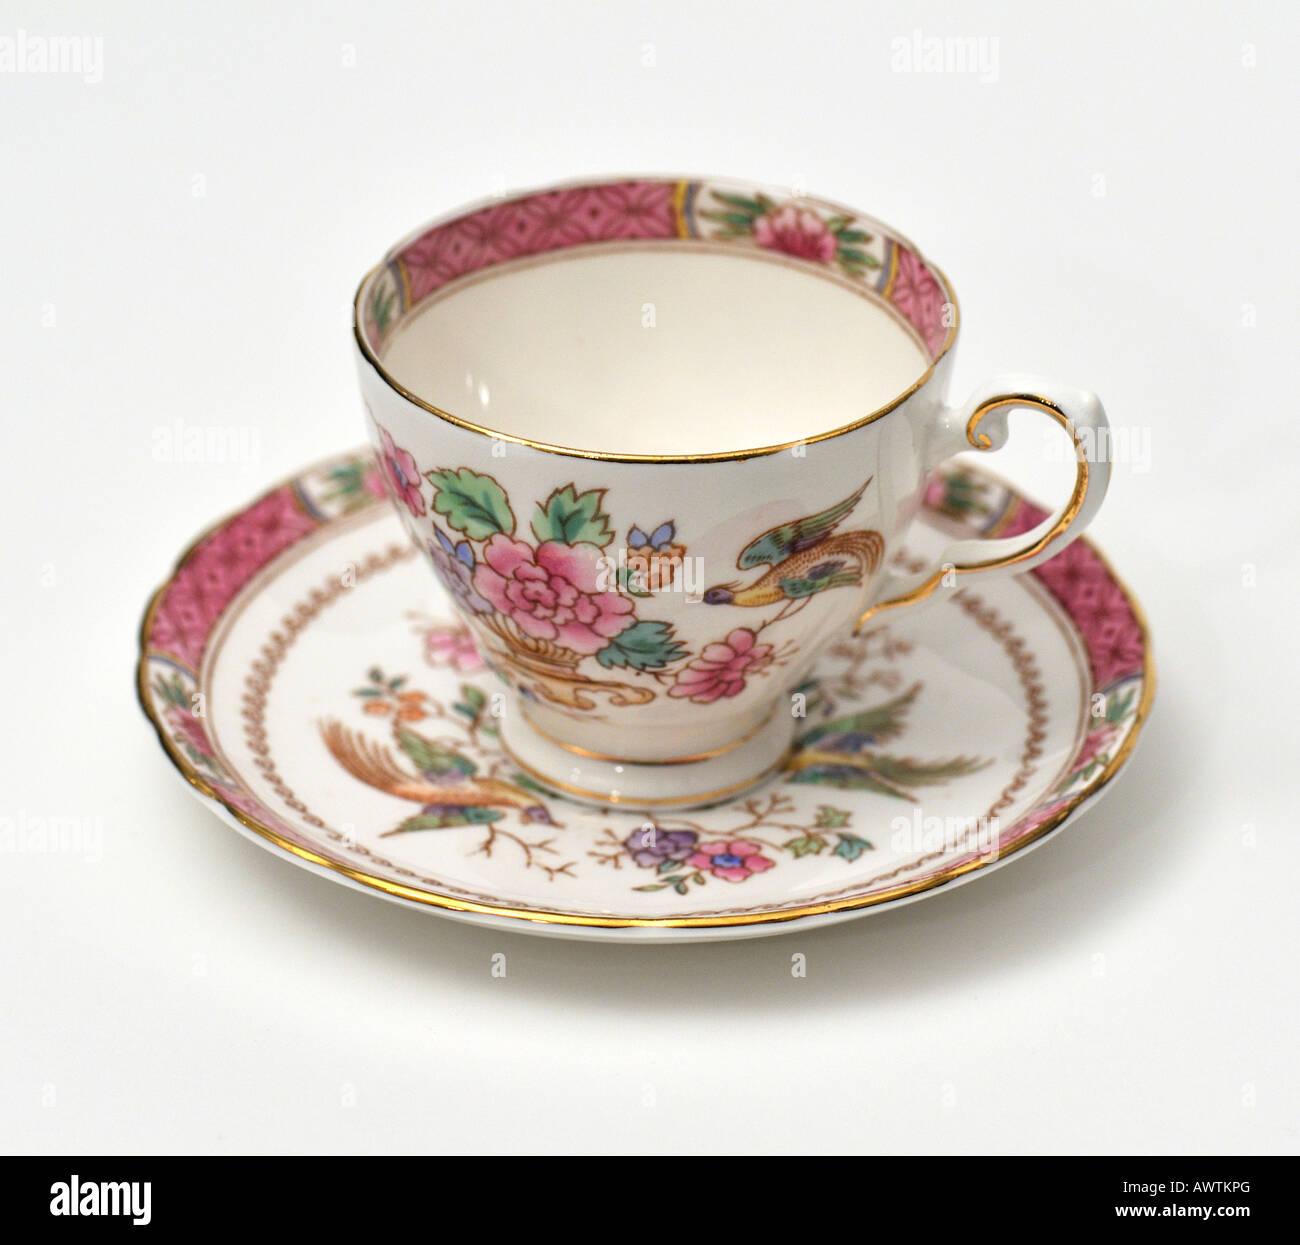 Fine English bone china porcelain English ceramics coffee tea cup